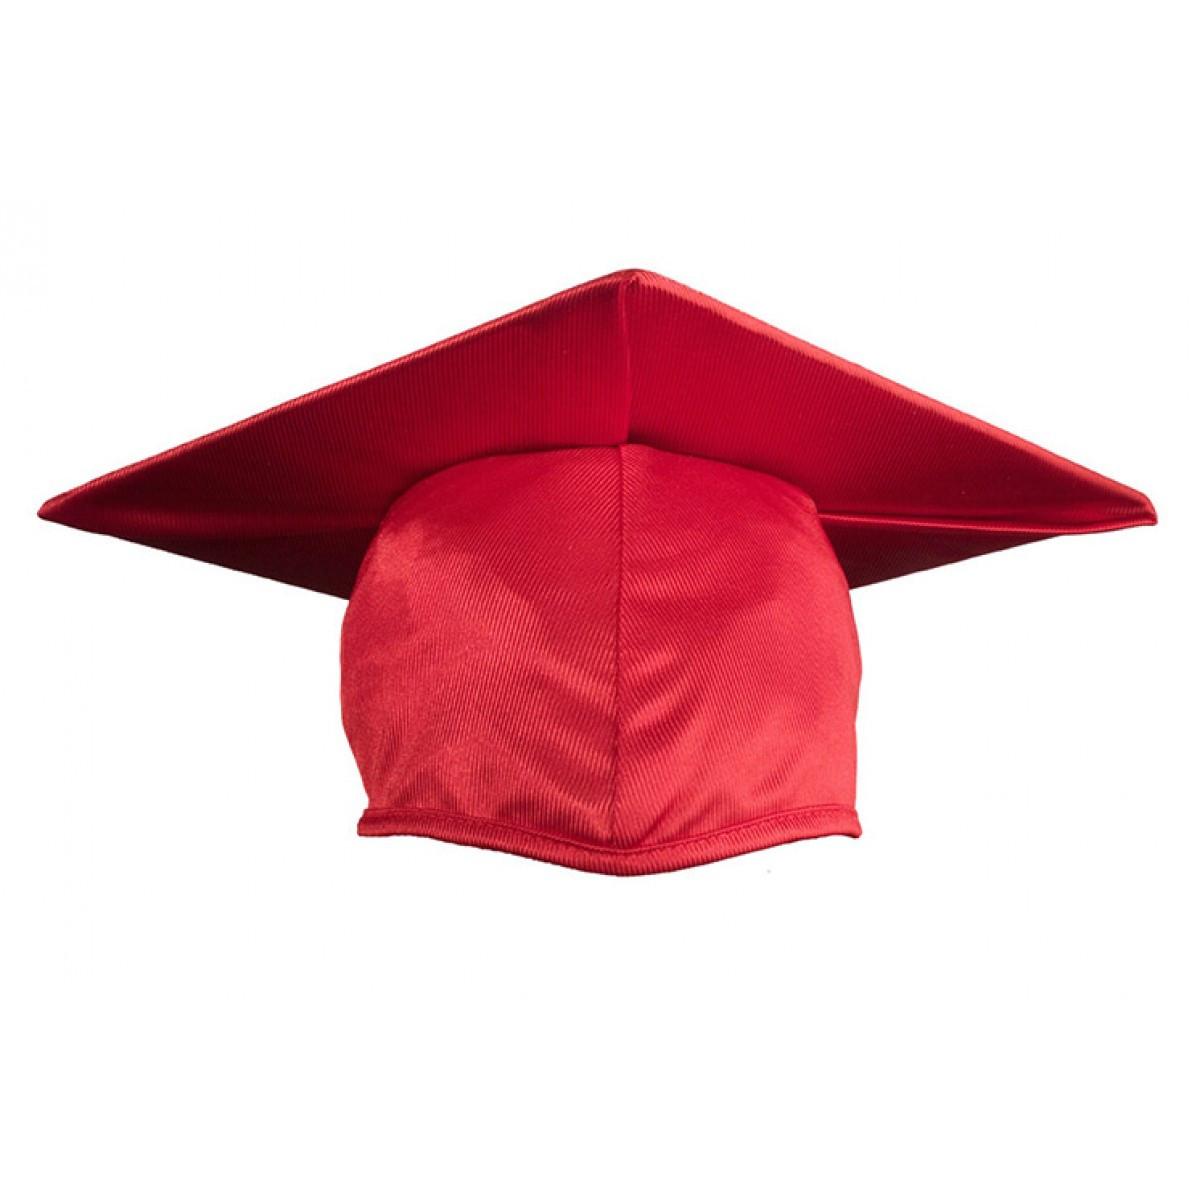 Child Shiny Red Cap, Gown & Tassel - Cool School Studios